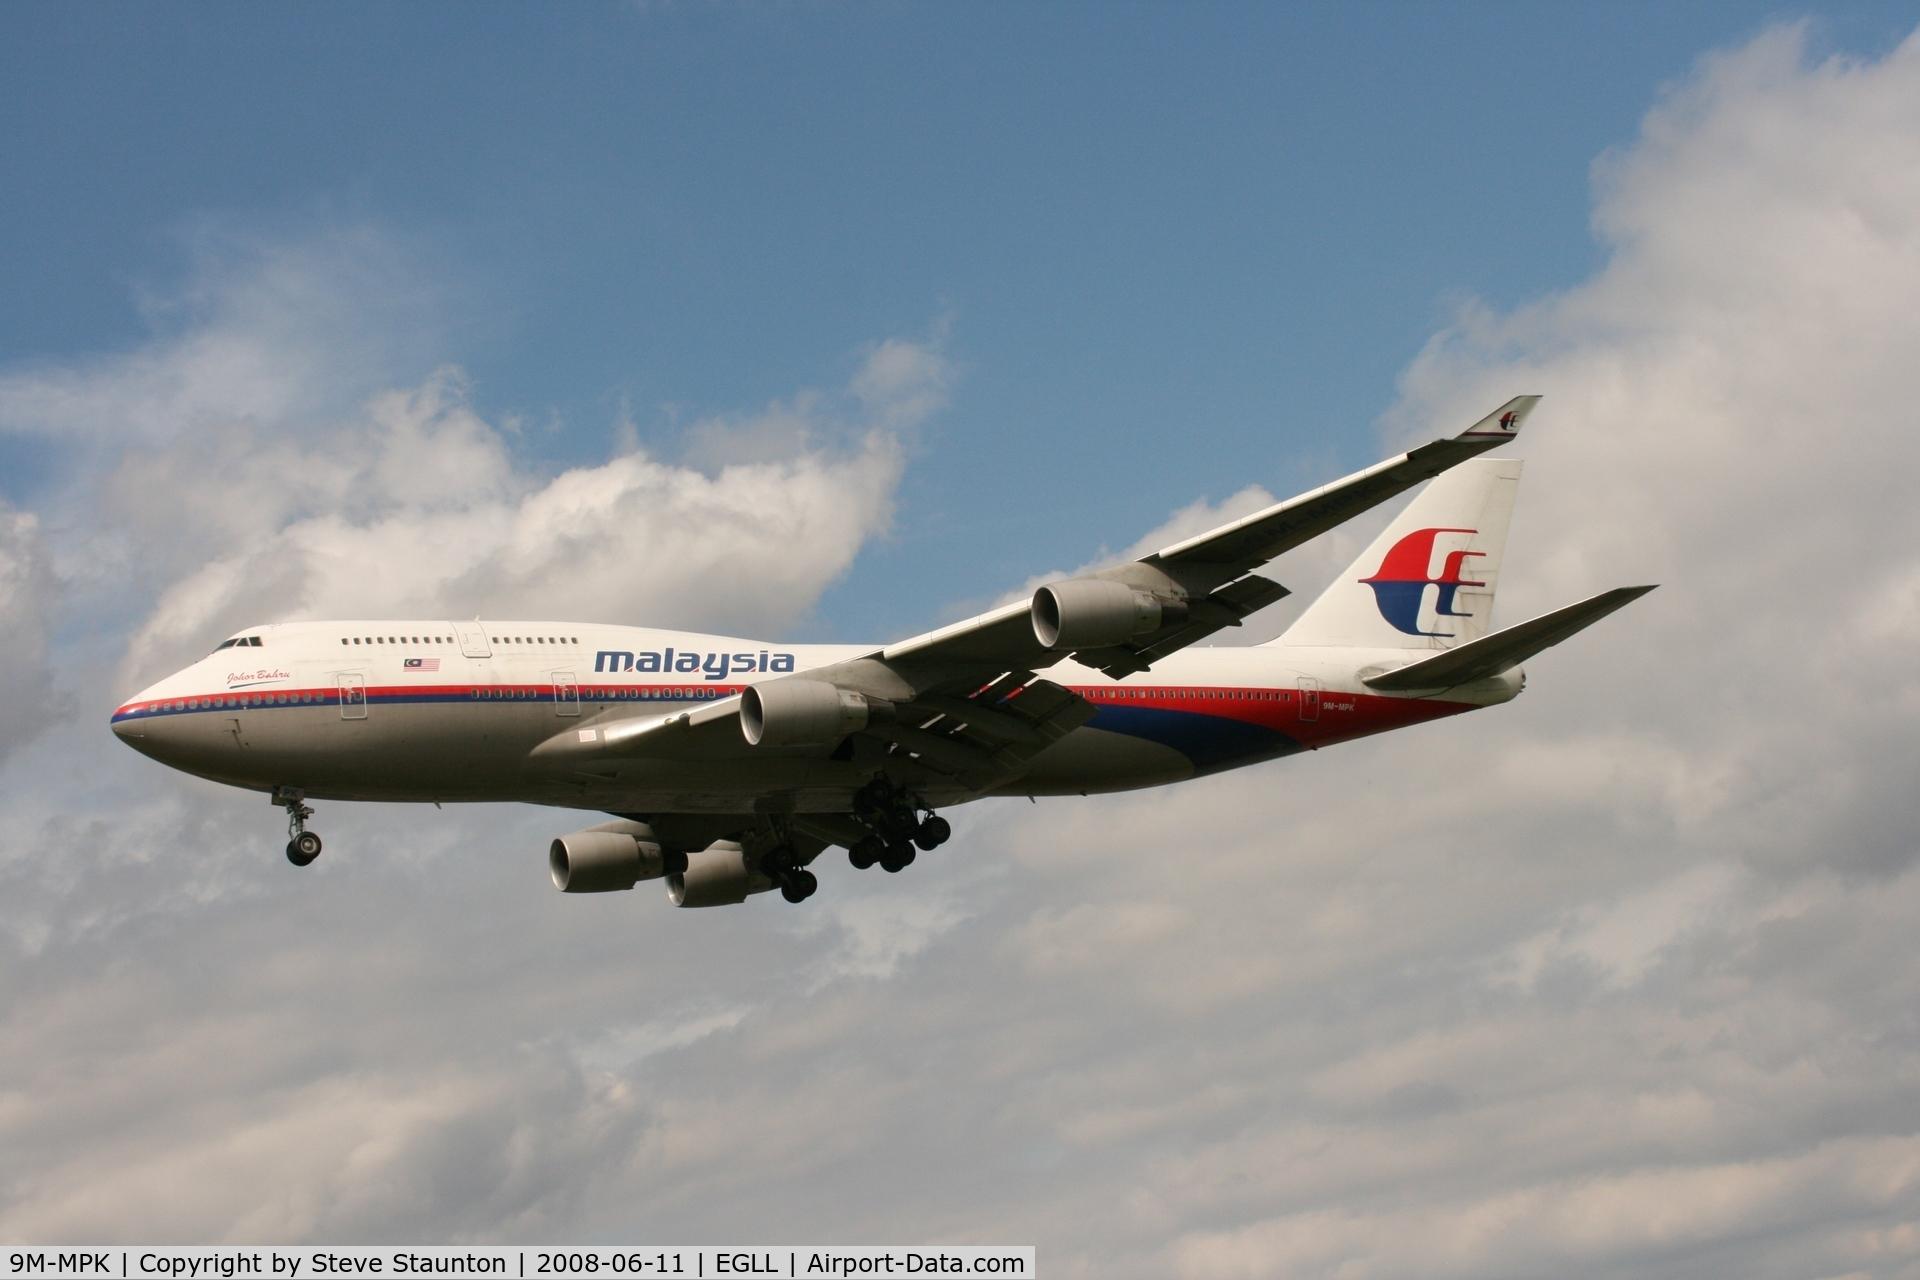 9M-MPK, 1998 Boeing 747-4H6 C/N 28427, Taken at London Heathrow 11th June 2008